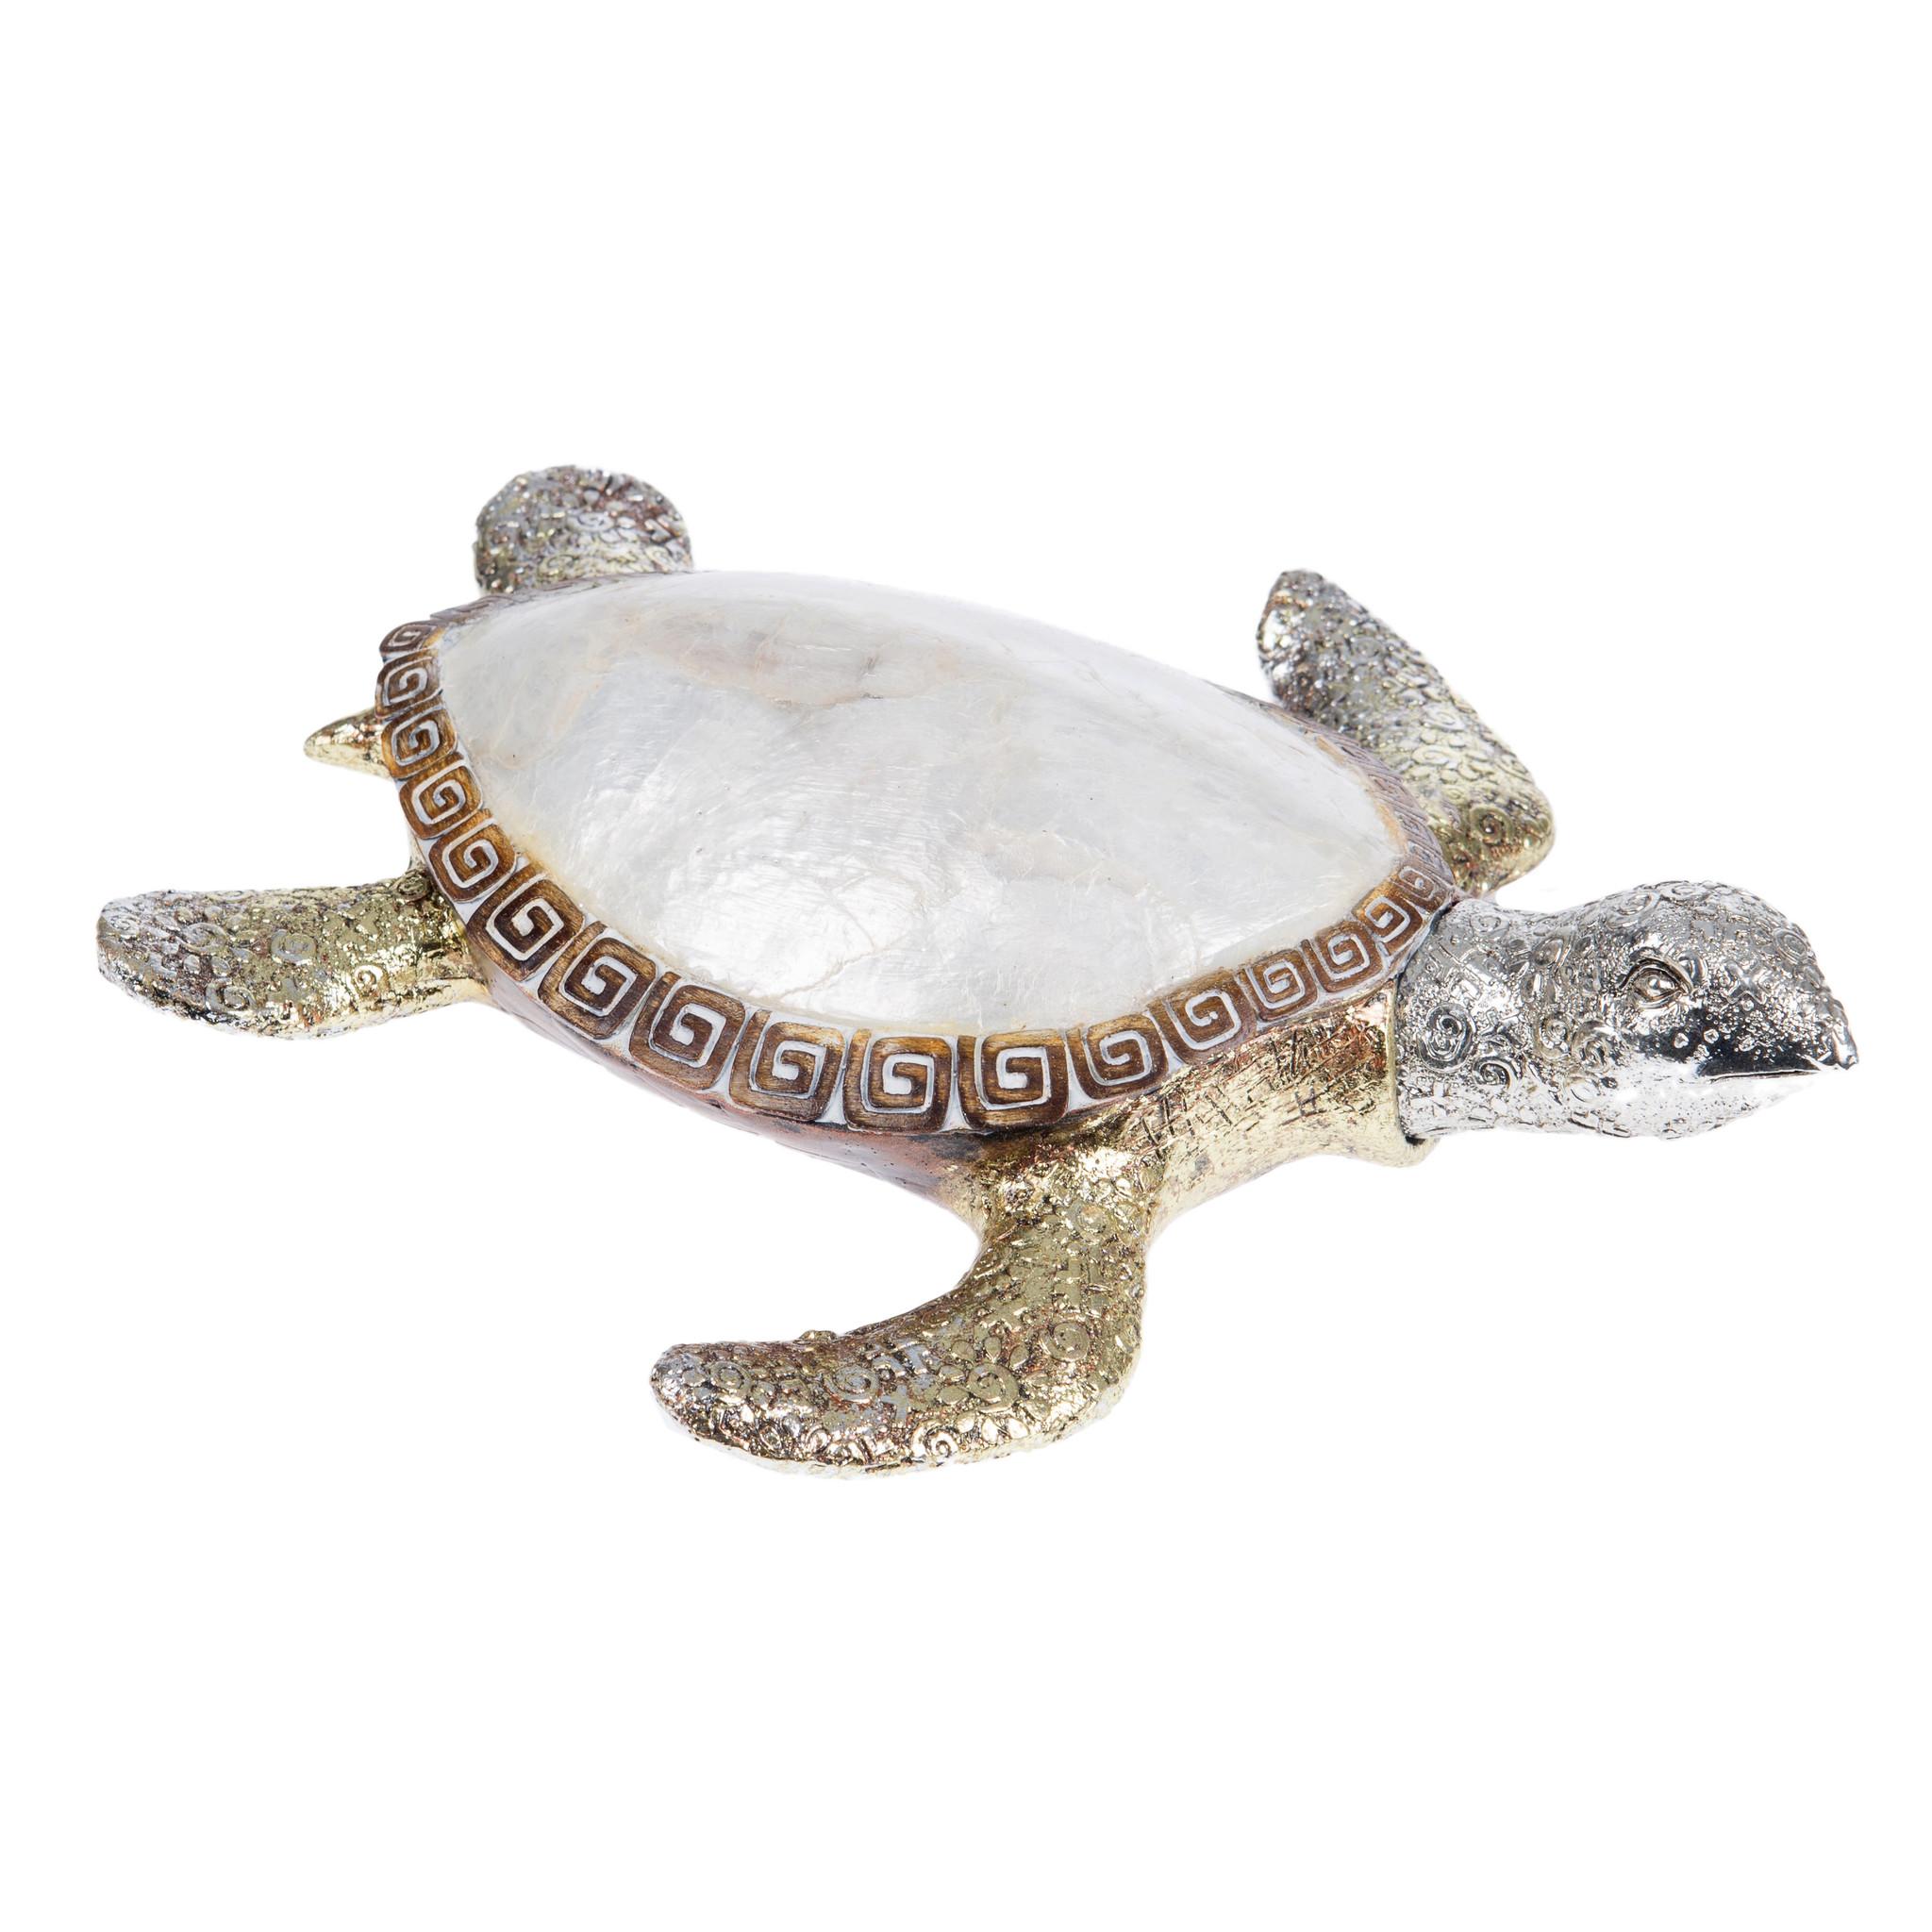 Статуэтка-черепаха EvansvilleСтатуэтки<br><br><br>Material: Полистоун<br>Width см: 22<br>Depth см: 19,5<br>Height см: 6